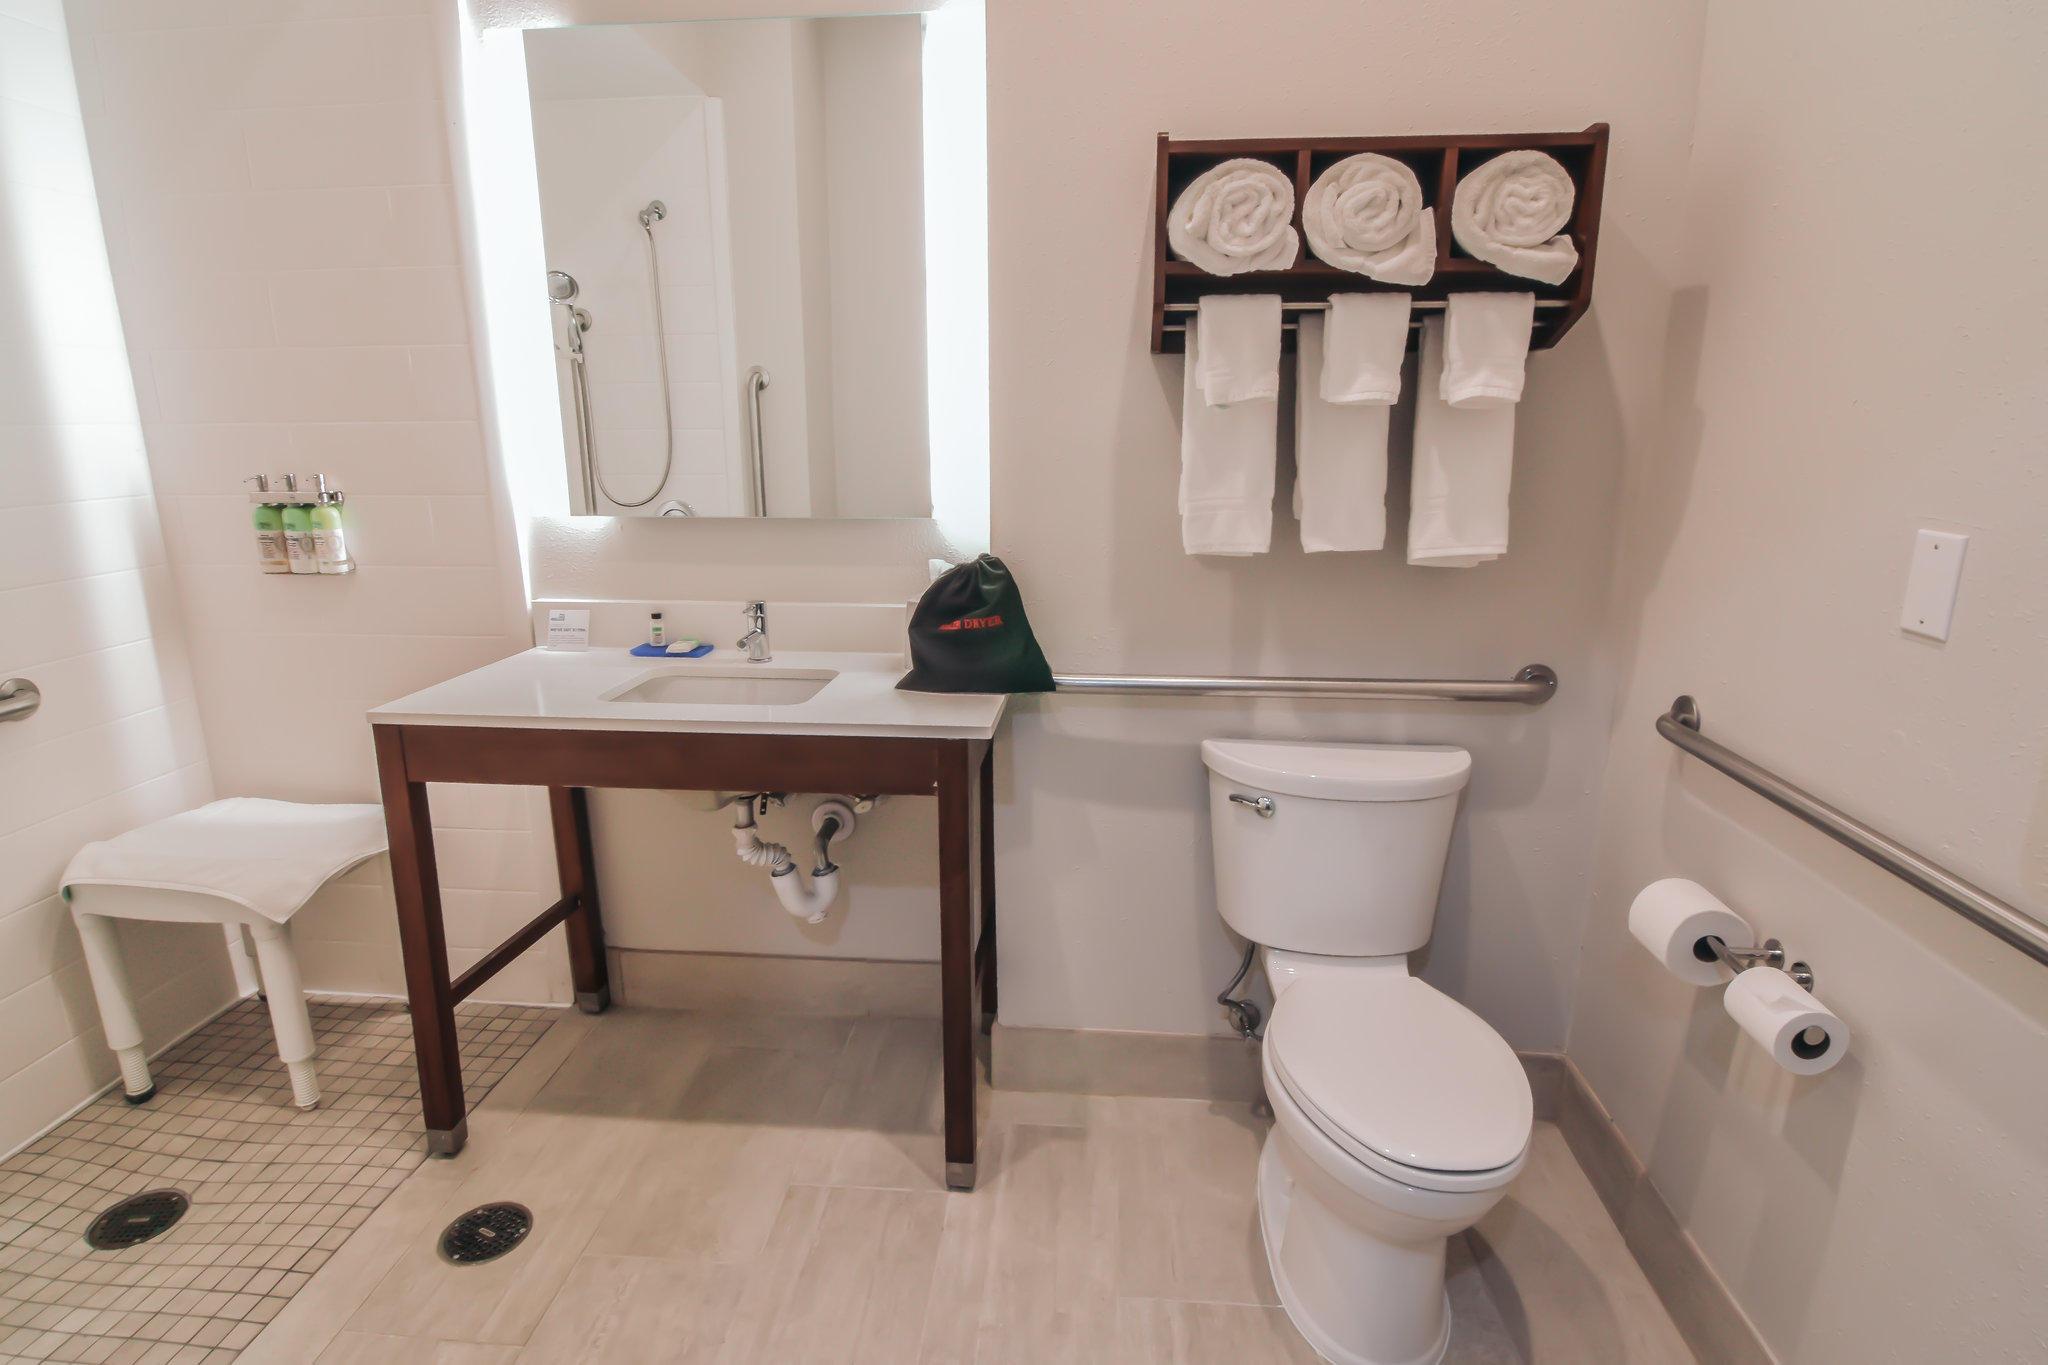 Holiday Inn Express & Suites Indianapolis Northwest